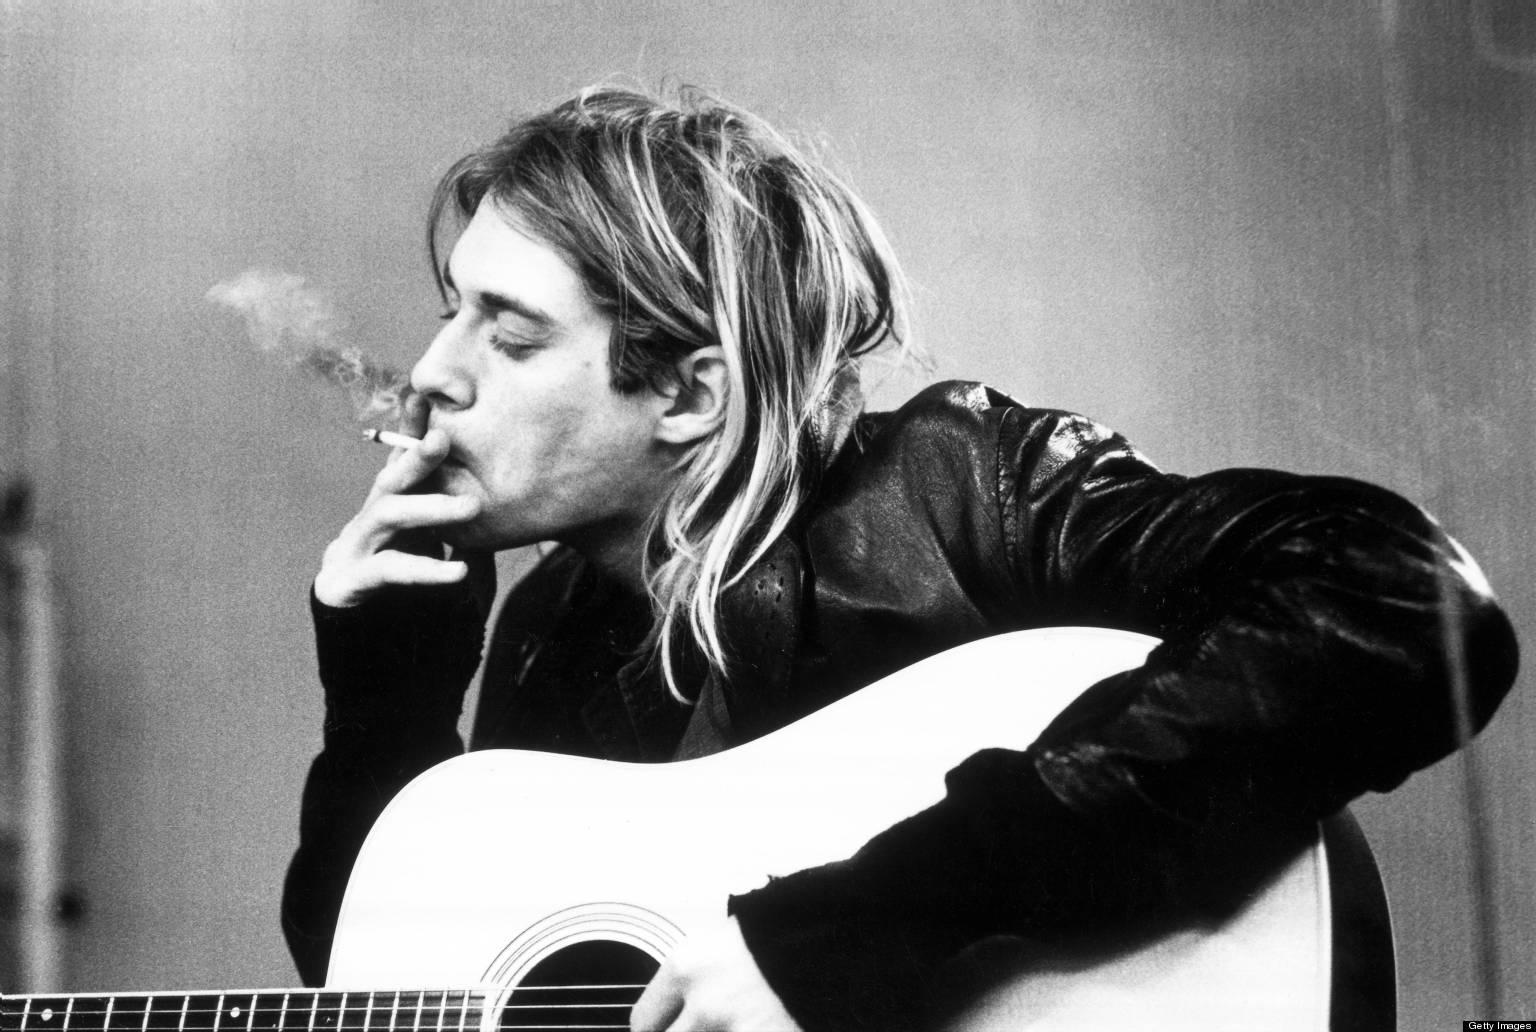 NETHERLANDS - NOVEMBER 25:  HILVERSUM  Photo of Kurt COBAIN and NIRVANA, Kurt Cobain recording in Hilversum Studios smoking cigarette  (Photo by Michel Linssen/Redferns)